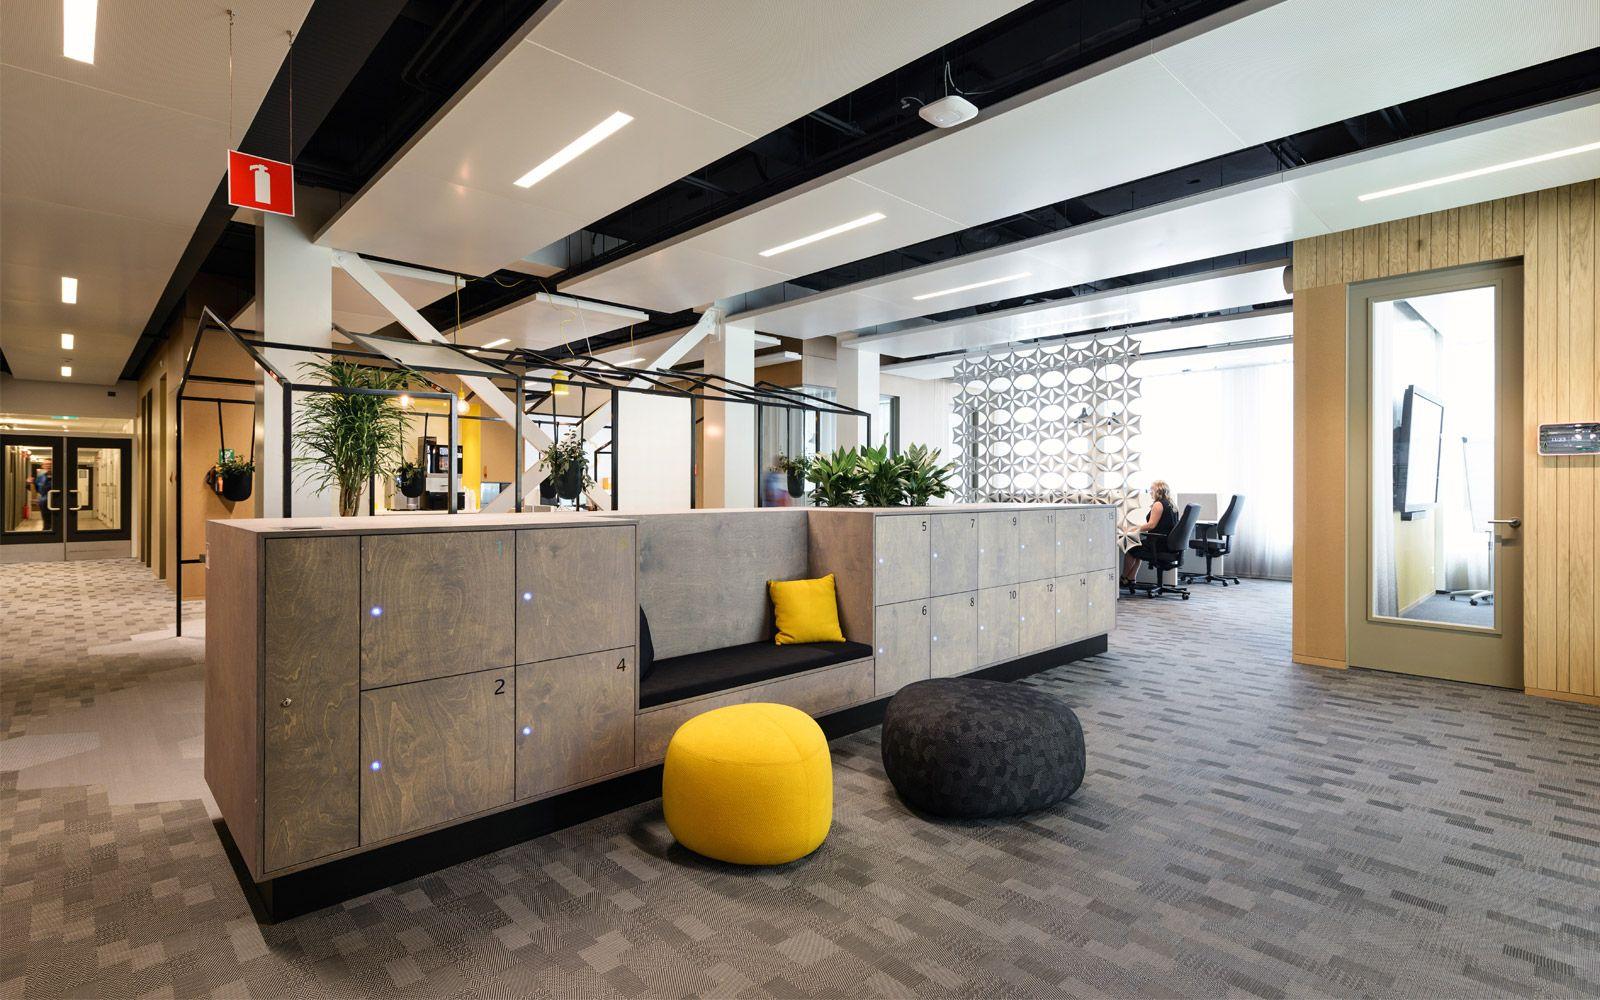 Offices At Sabic Europe Manufacturing By Broekbakema Gebouwen Projecten Hergebruiken